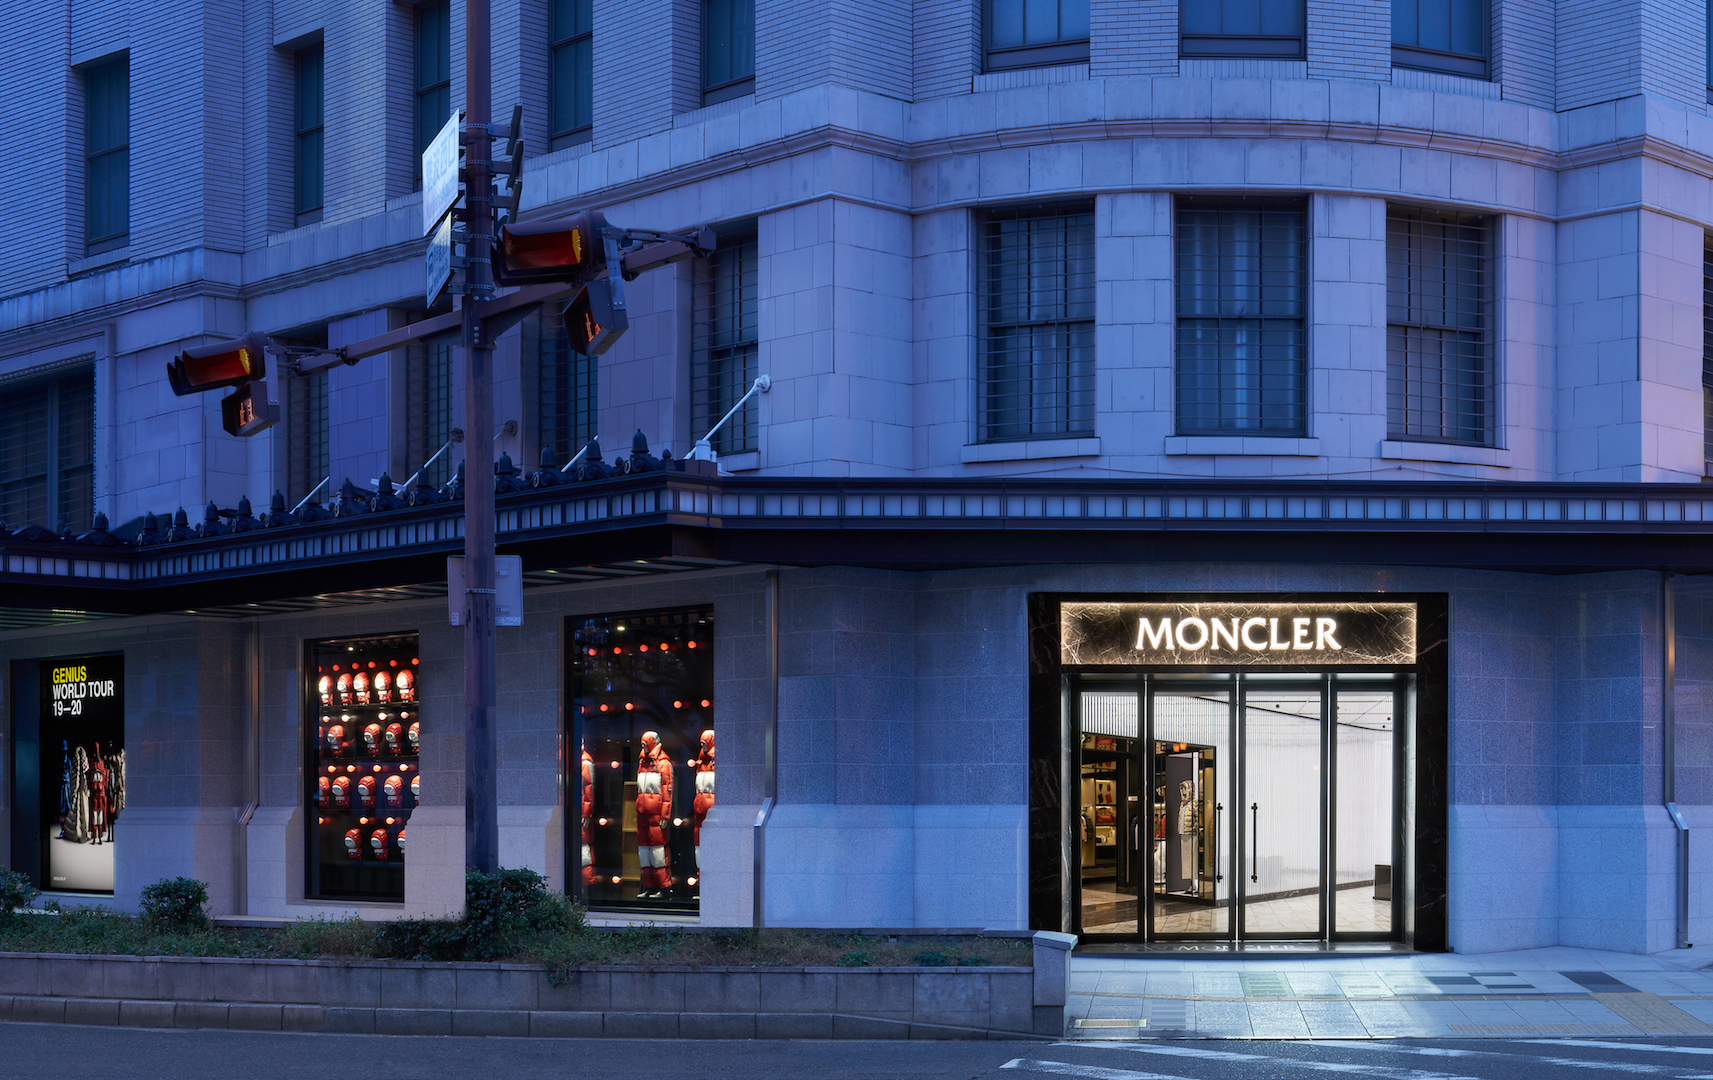 MONCLER new store in Osaka (Namba)